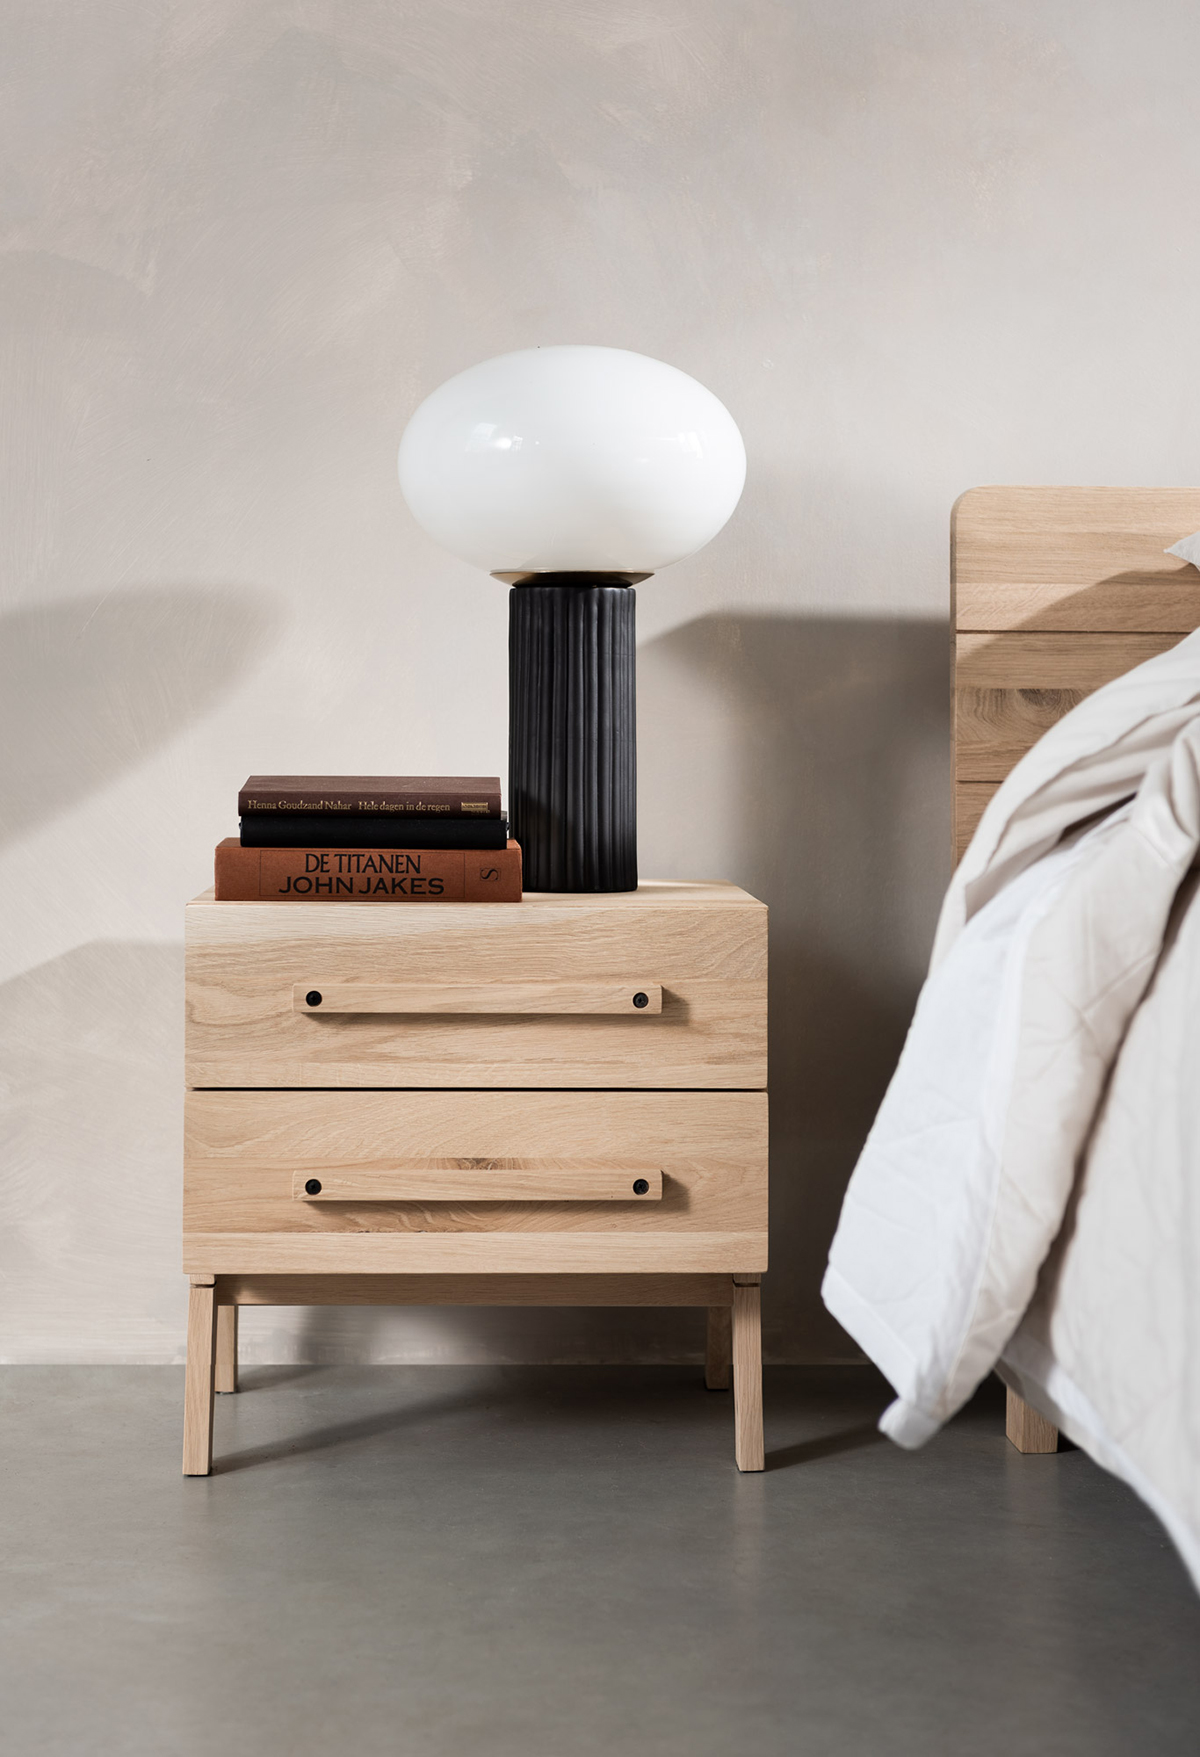 Slaapkamer houten bed nachtkastje bedlamp Swiss Sense